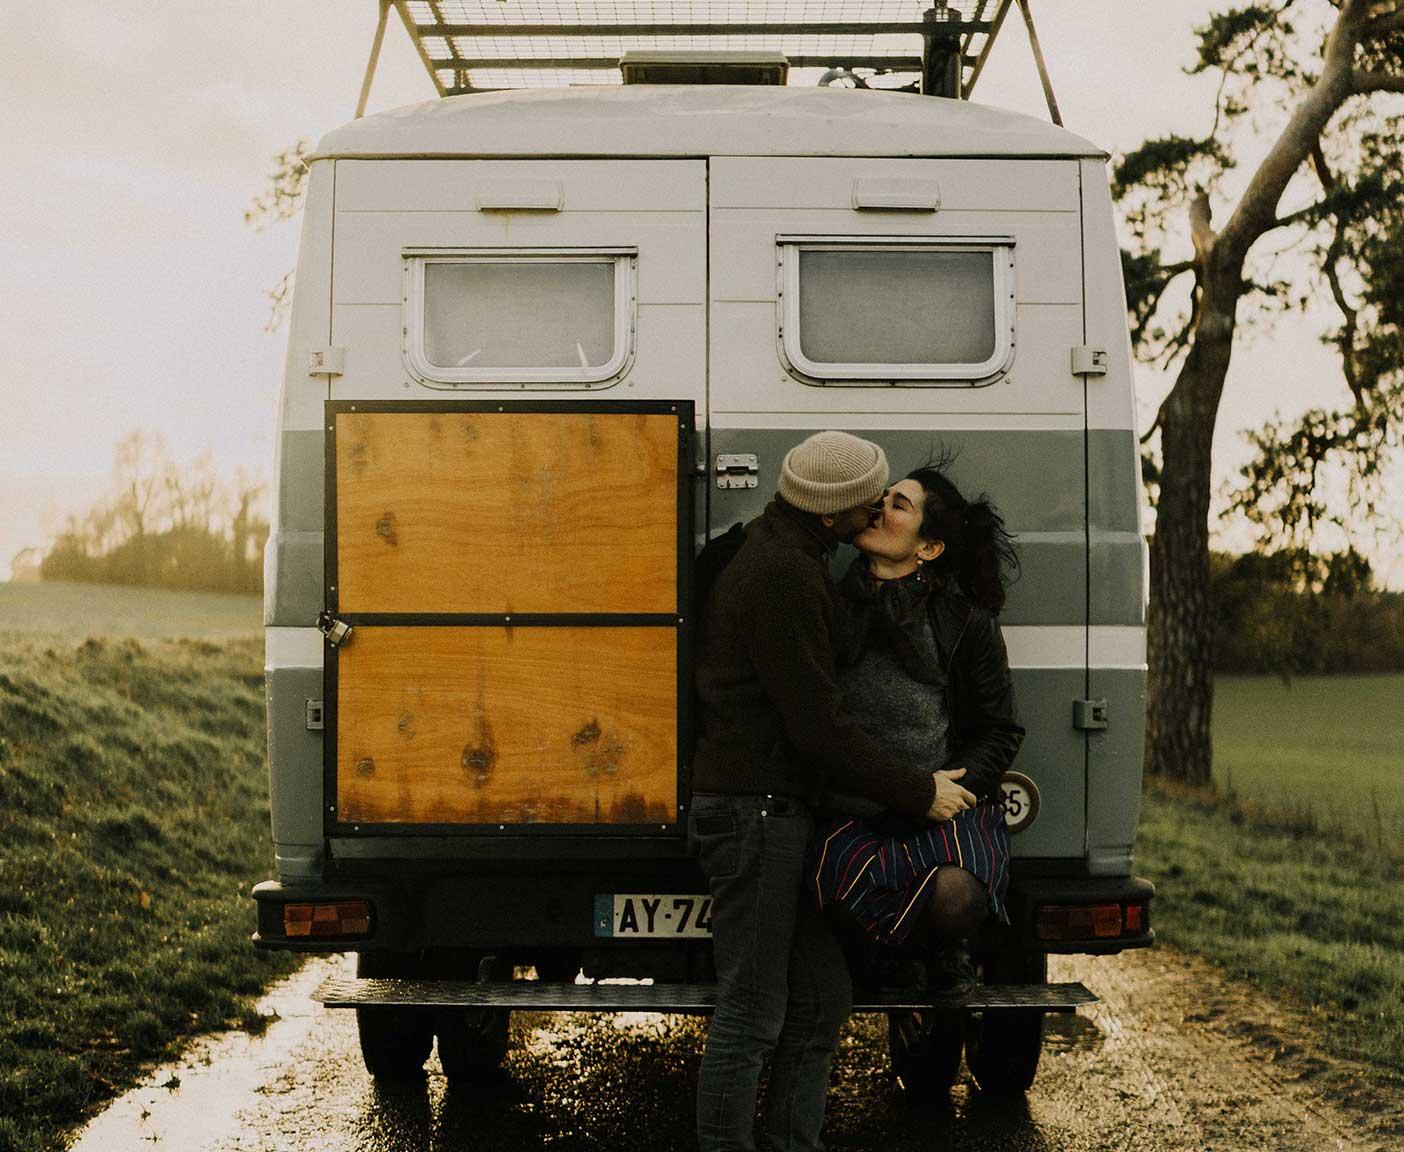 Mercedes-benz-508-d-verbrauch-innenausbau-wohnmobil-camper-couple-kissing